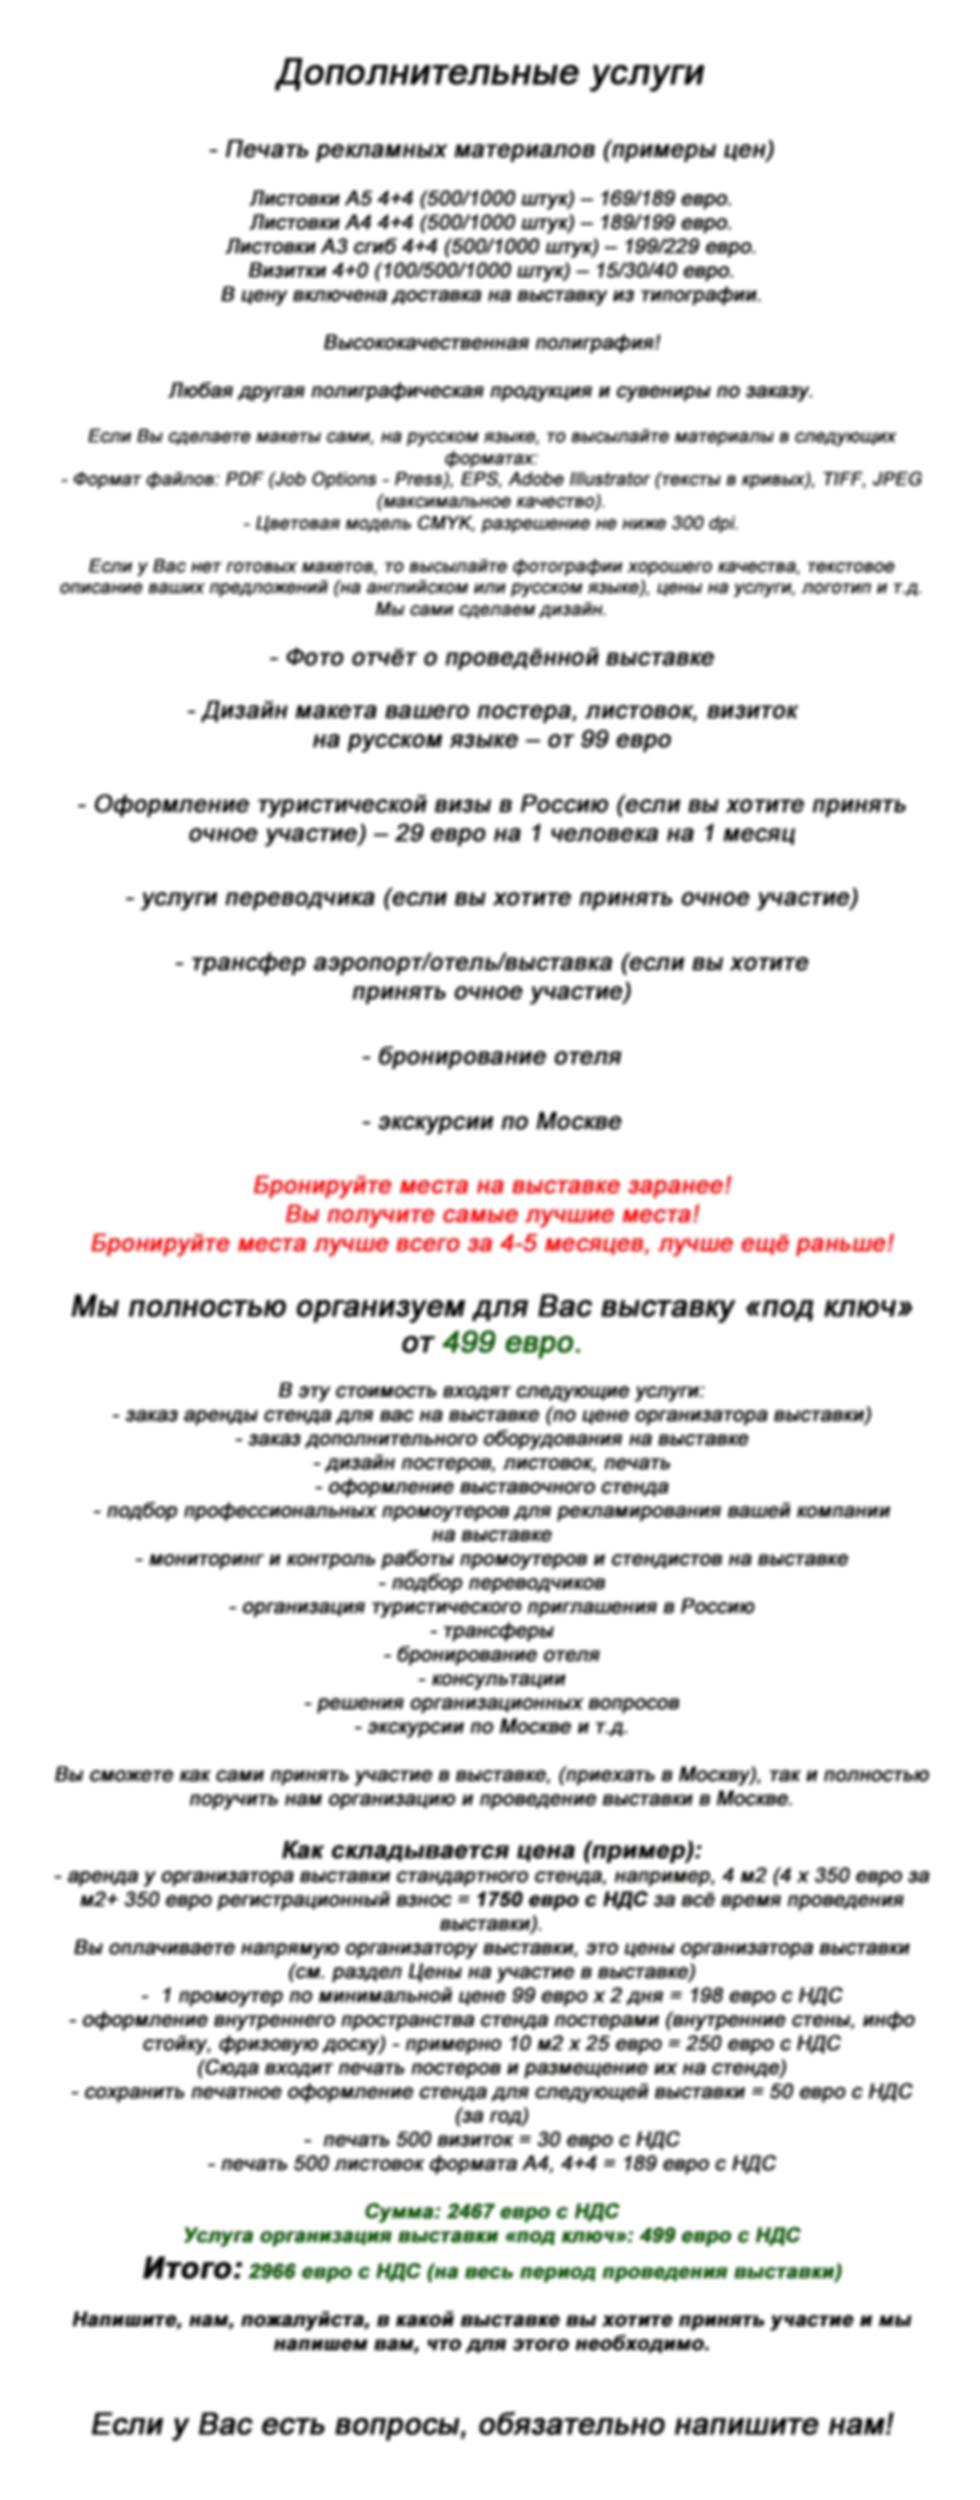 5 Property Show доп услуги рус.jpg